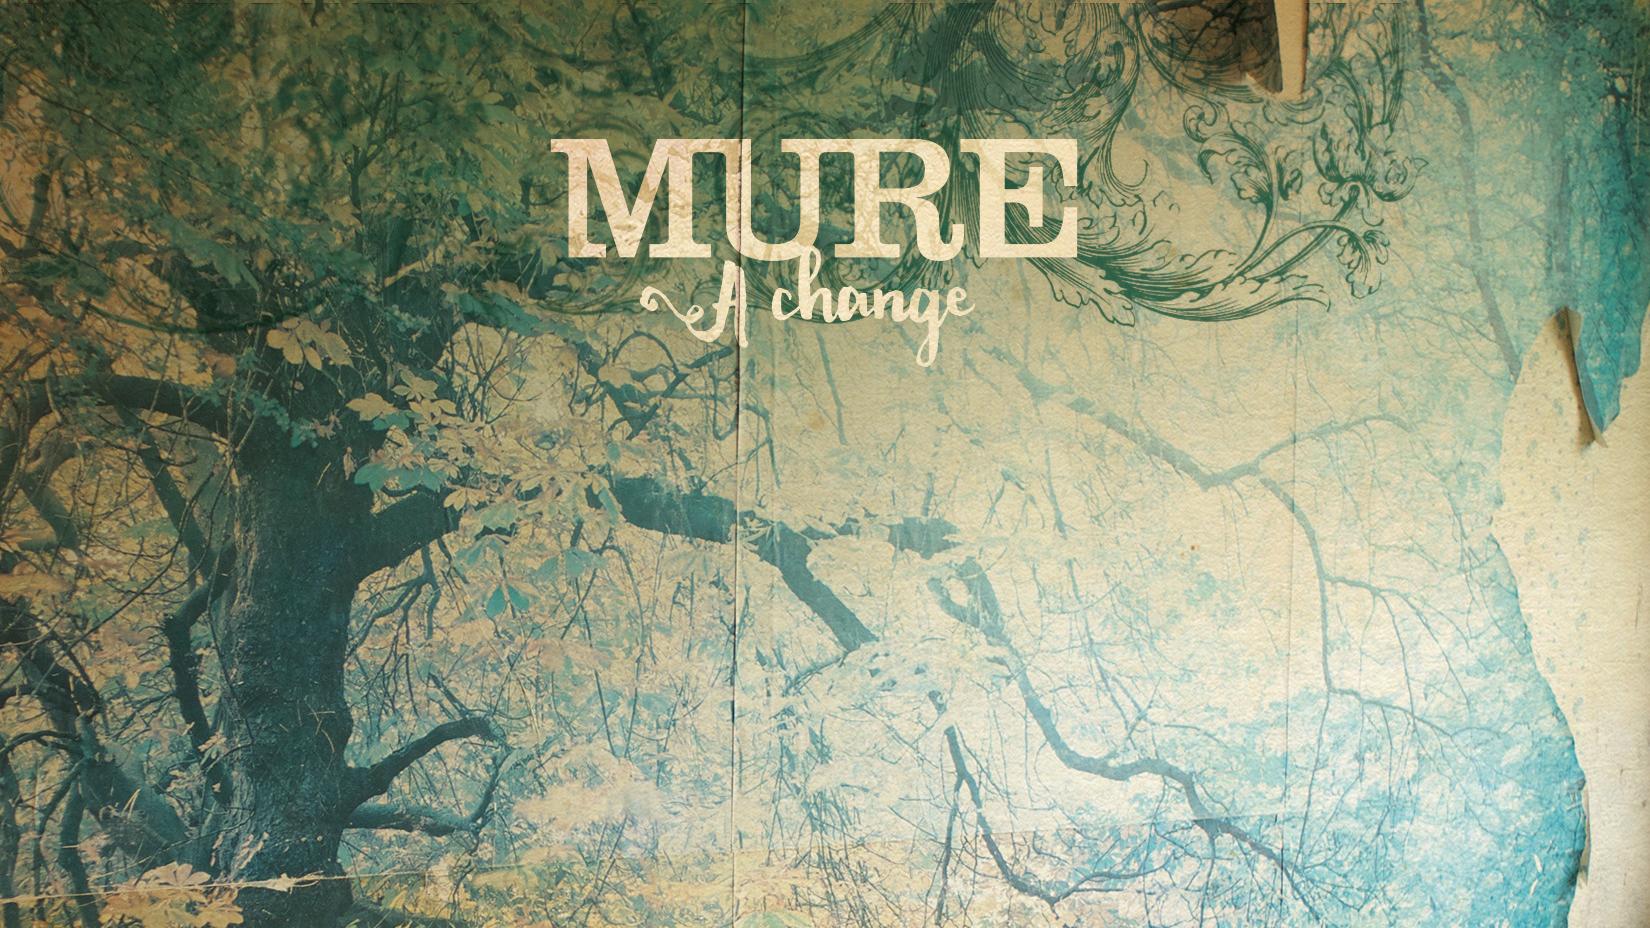 MURE-a_change-couv_digipack-1516734555.jpg